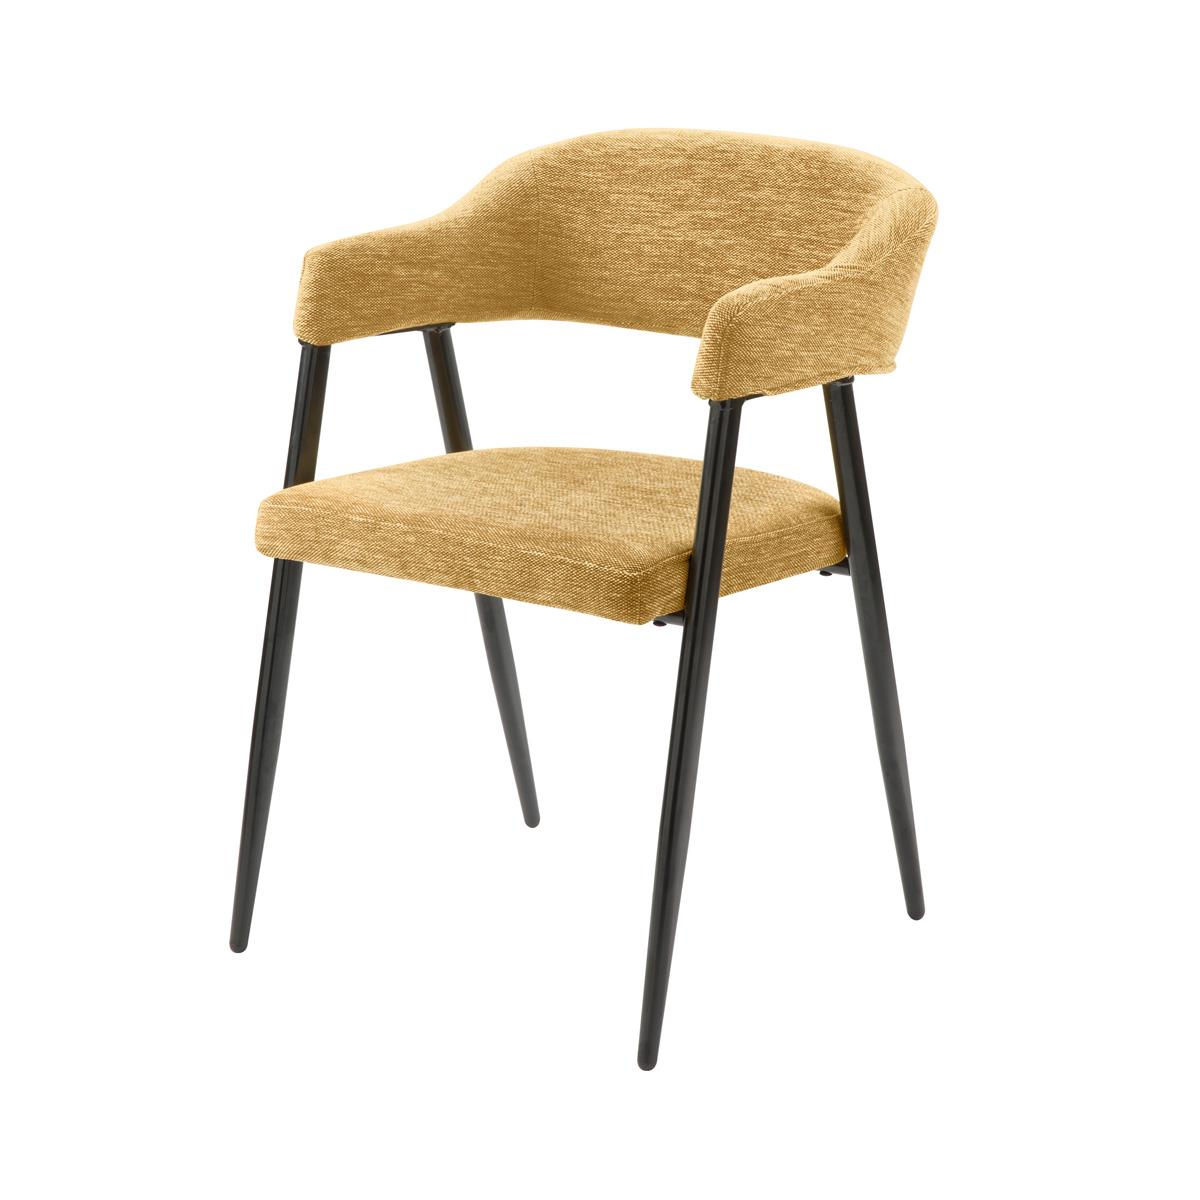 Chaise en tissu jaune chiné